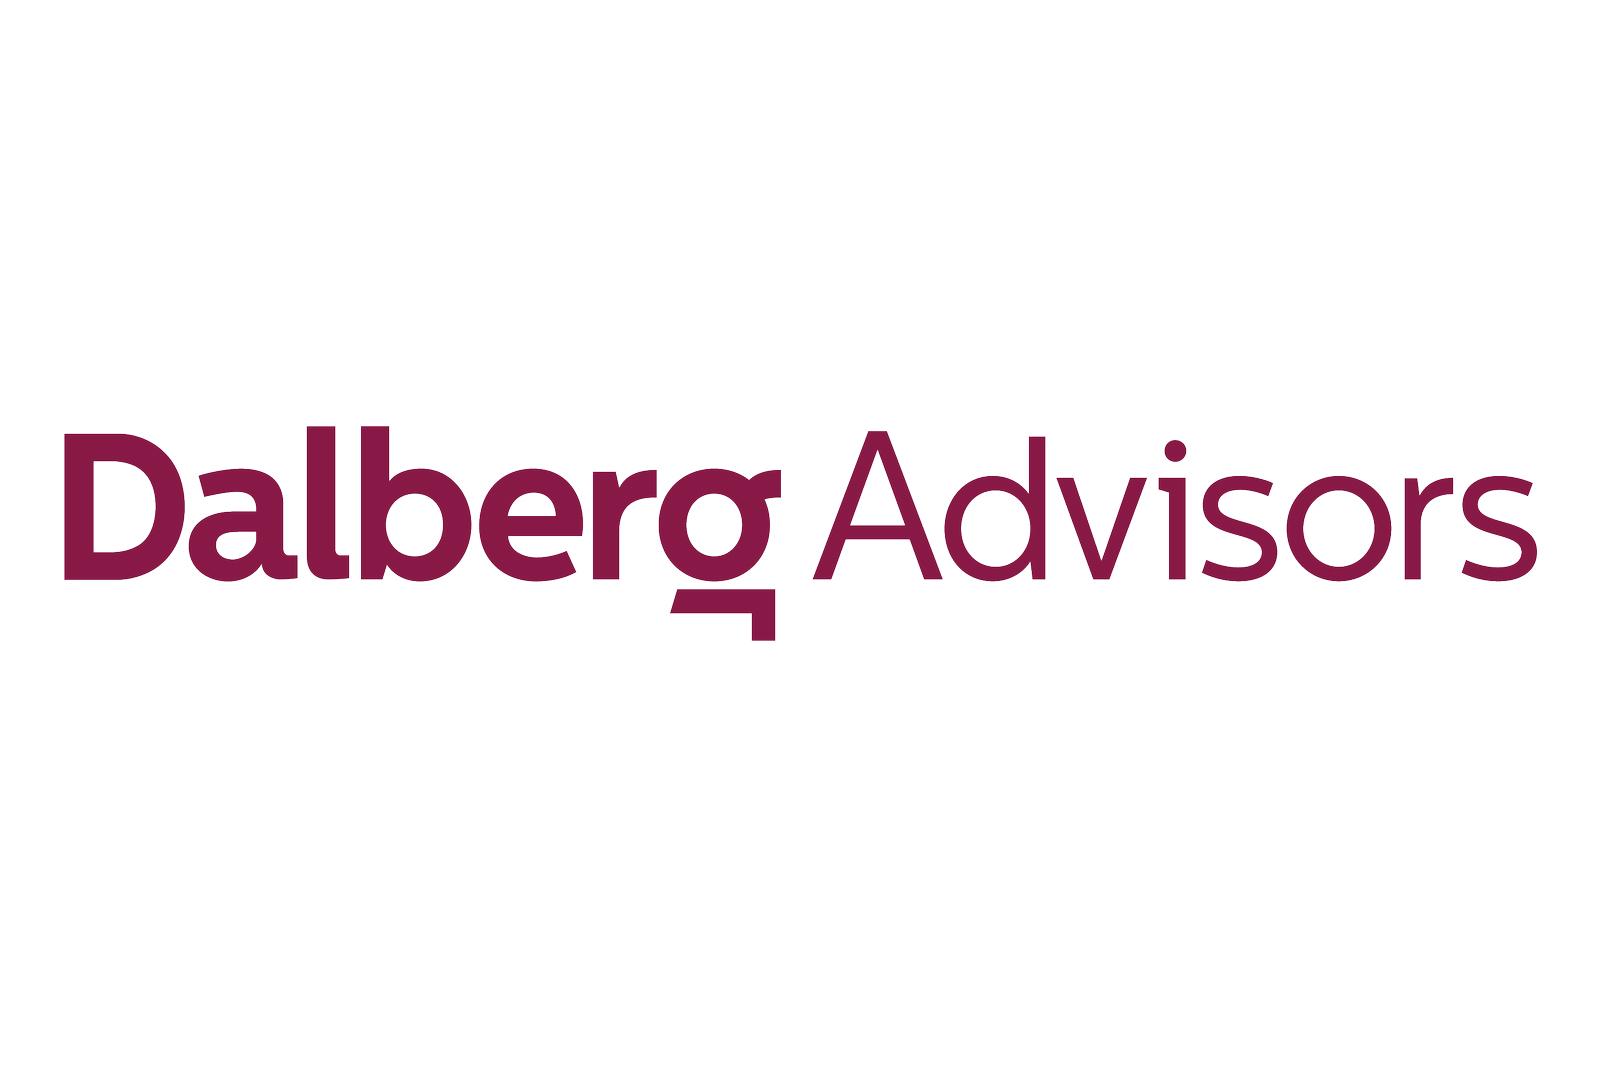 Dalberg logo.jpg